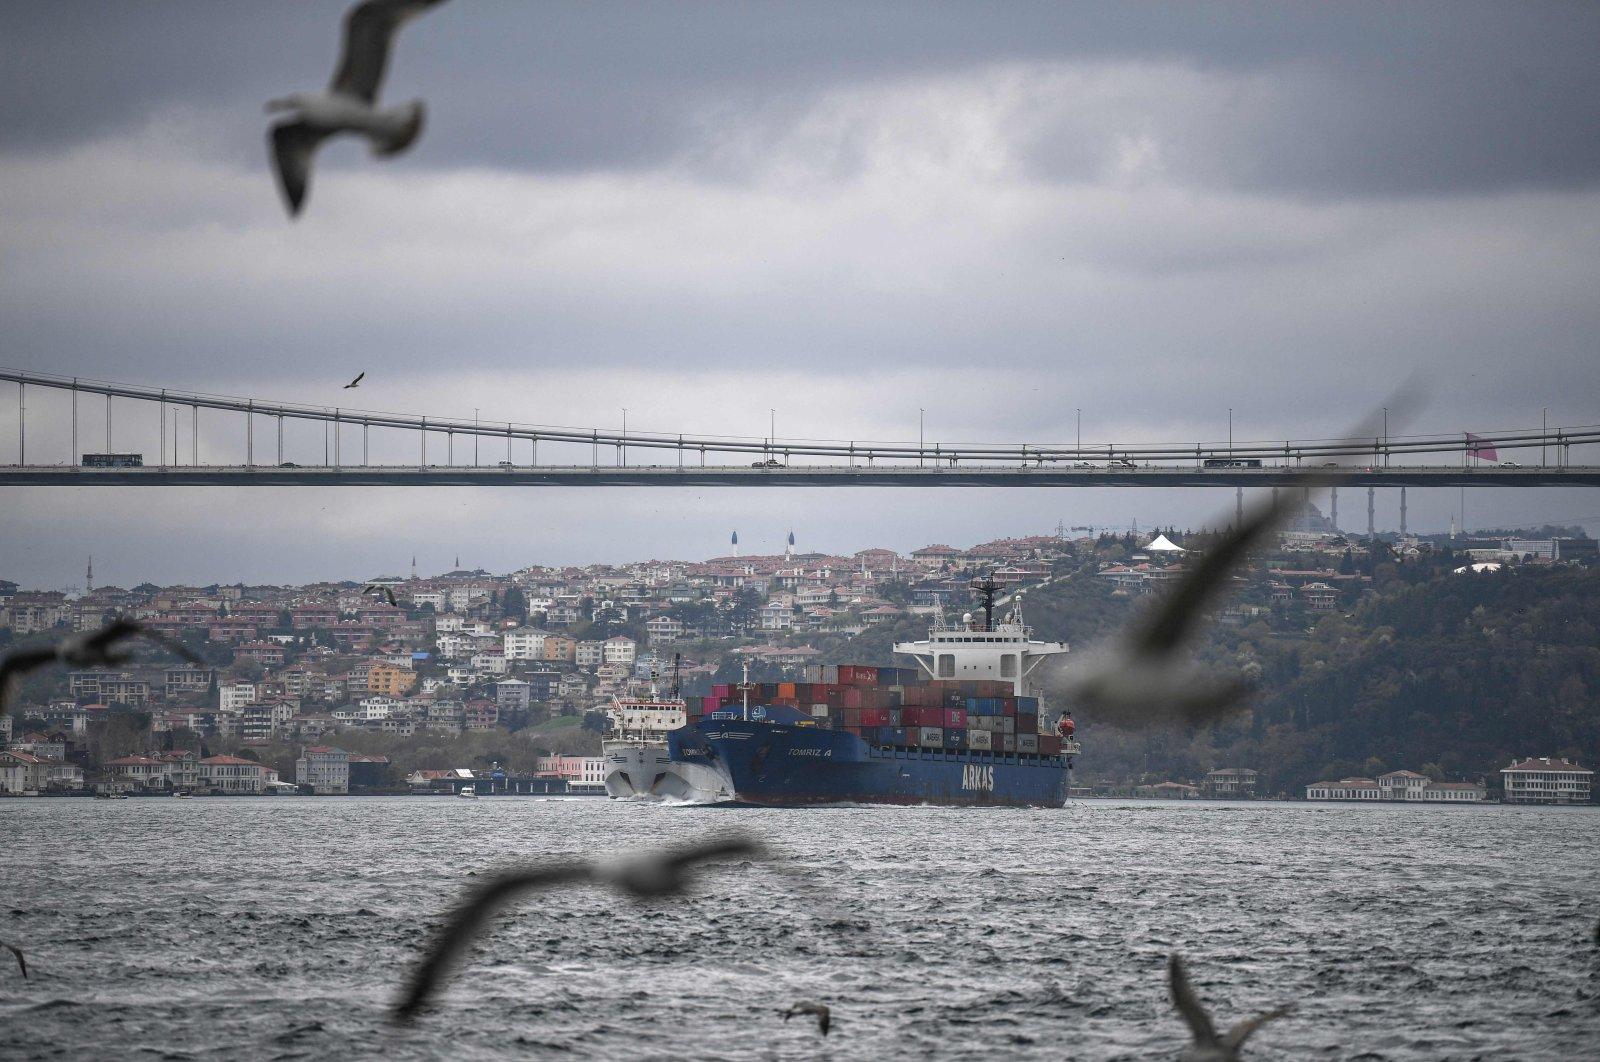 A container ship sails through the Bosporus, Istanbul, Turkey, April 23, 2021. (AFP Photo)